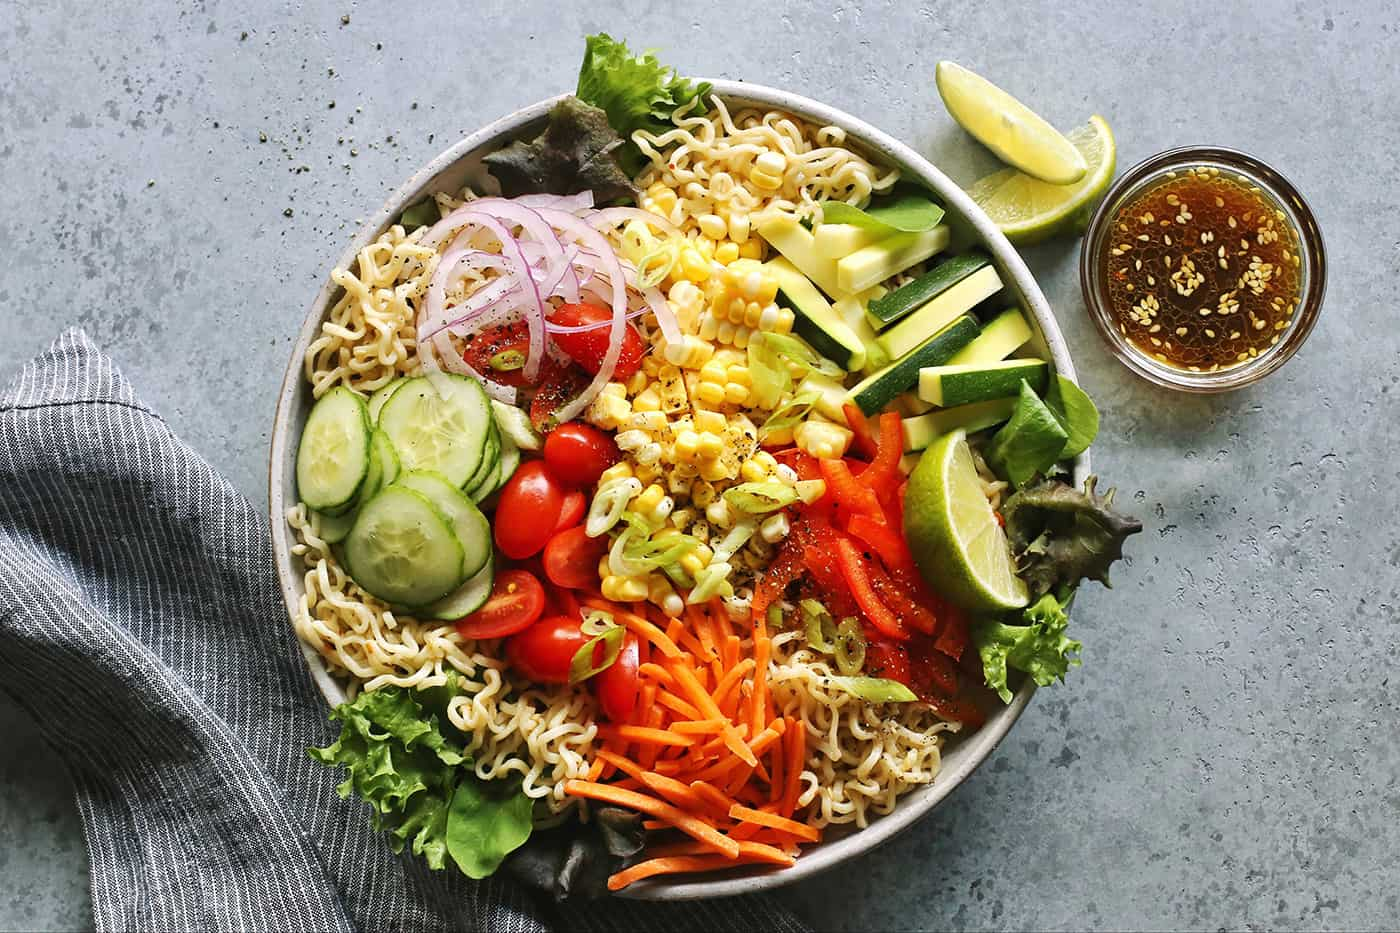 a light gray bowl of salad ramen